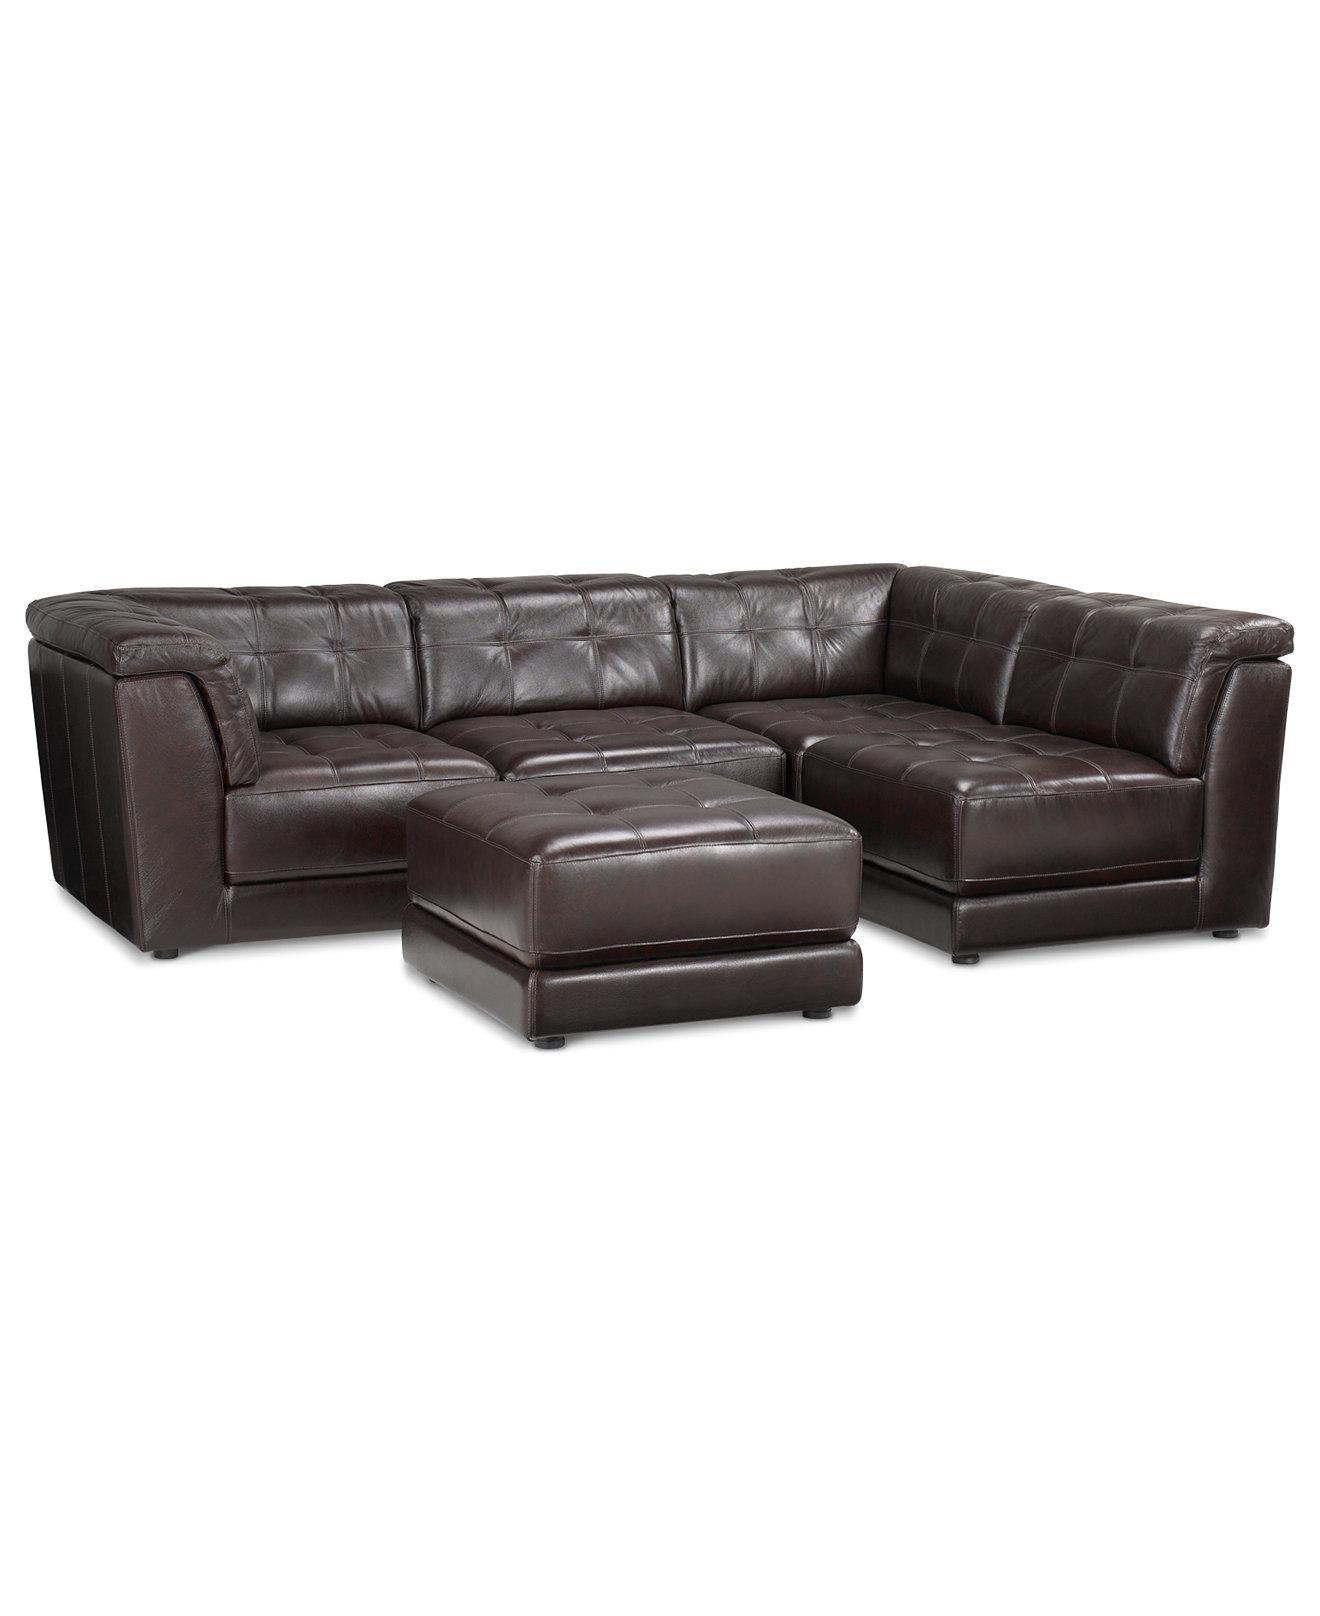 Sofas: Elegant Living Room Sofas Designmacys Sectional Sofa Throughout Macys Leather Sectional Sofa (View 13 of 20)